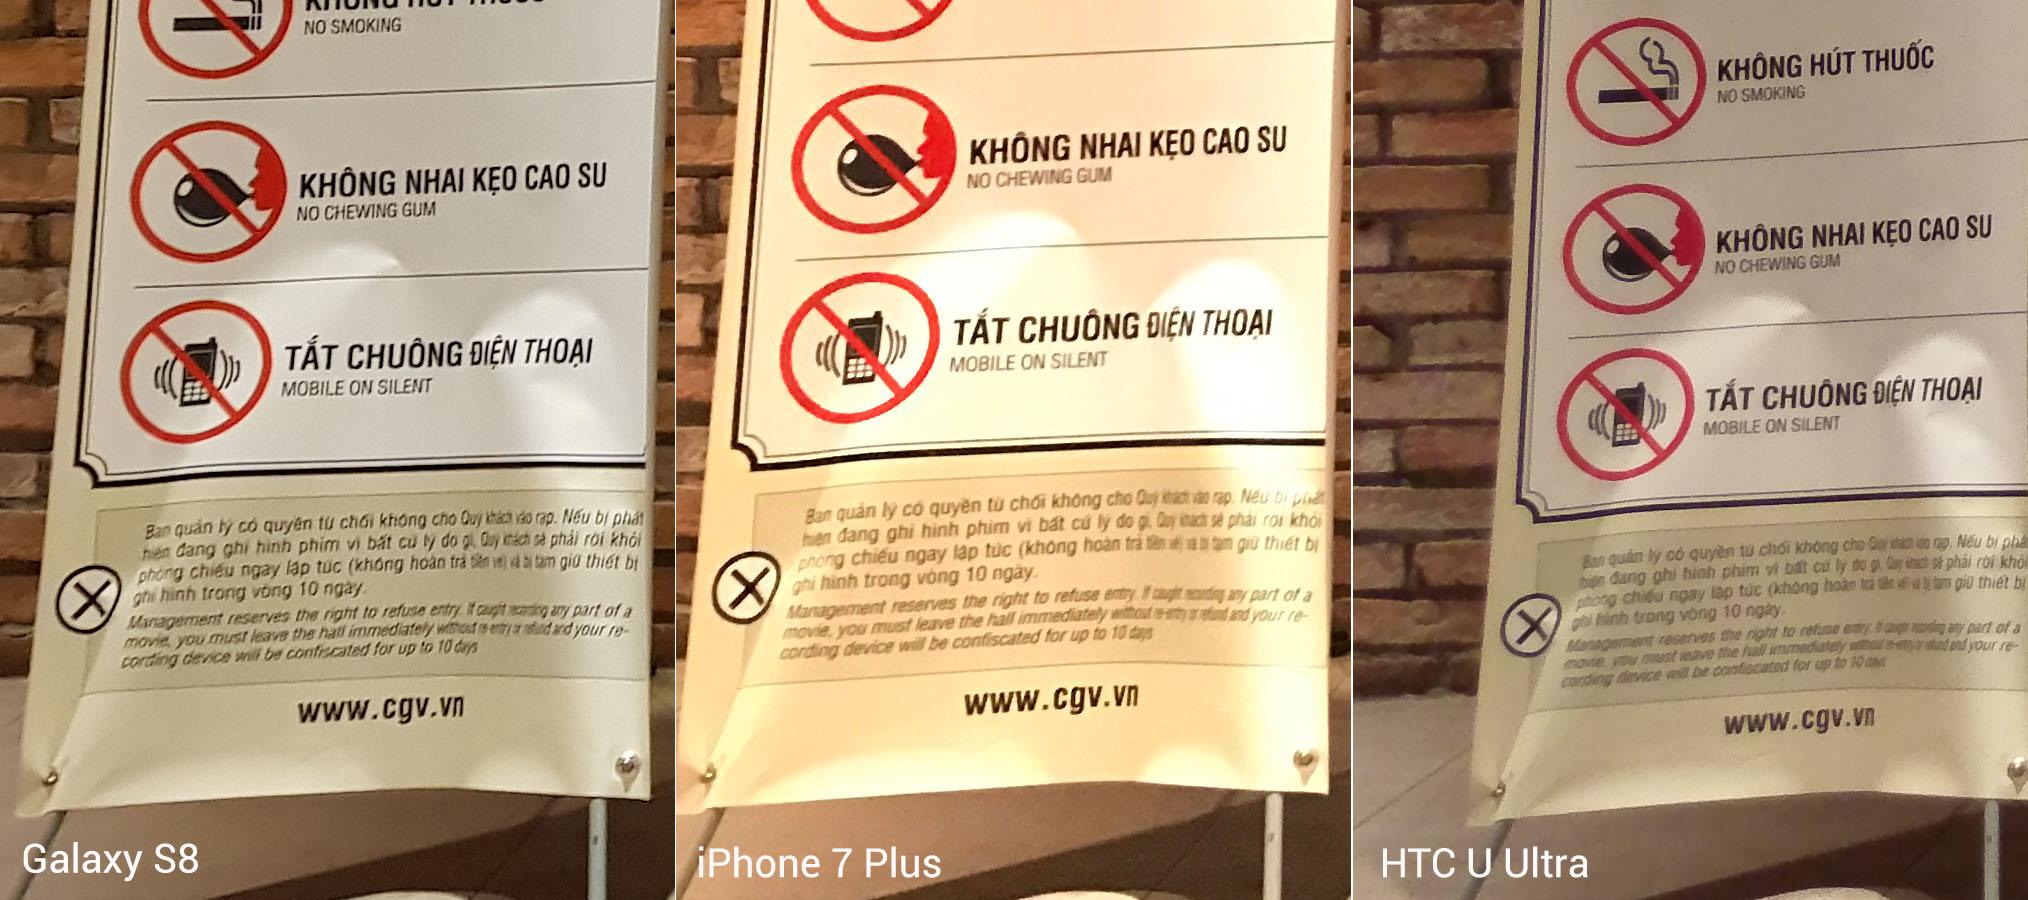 Đọ chi tiết camera: Galaxy S8, iPhone 7 Plus và HTC U Ultra - ảnh 58